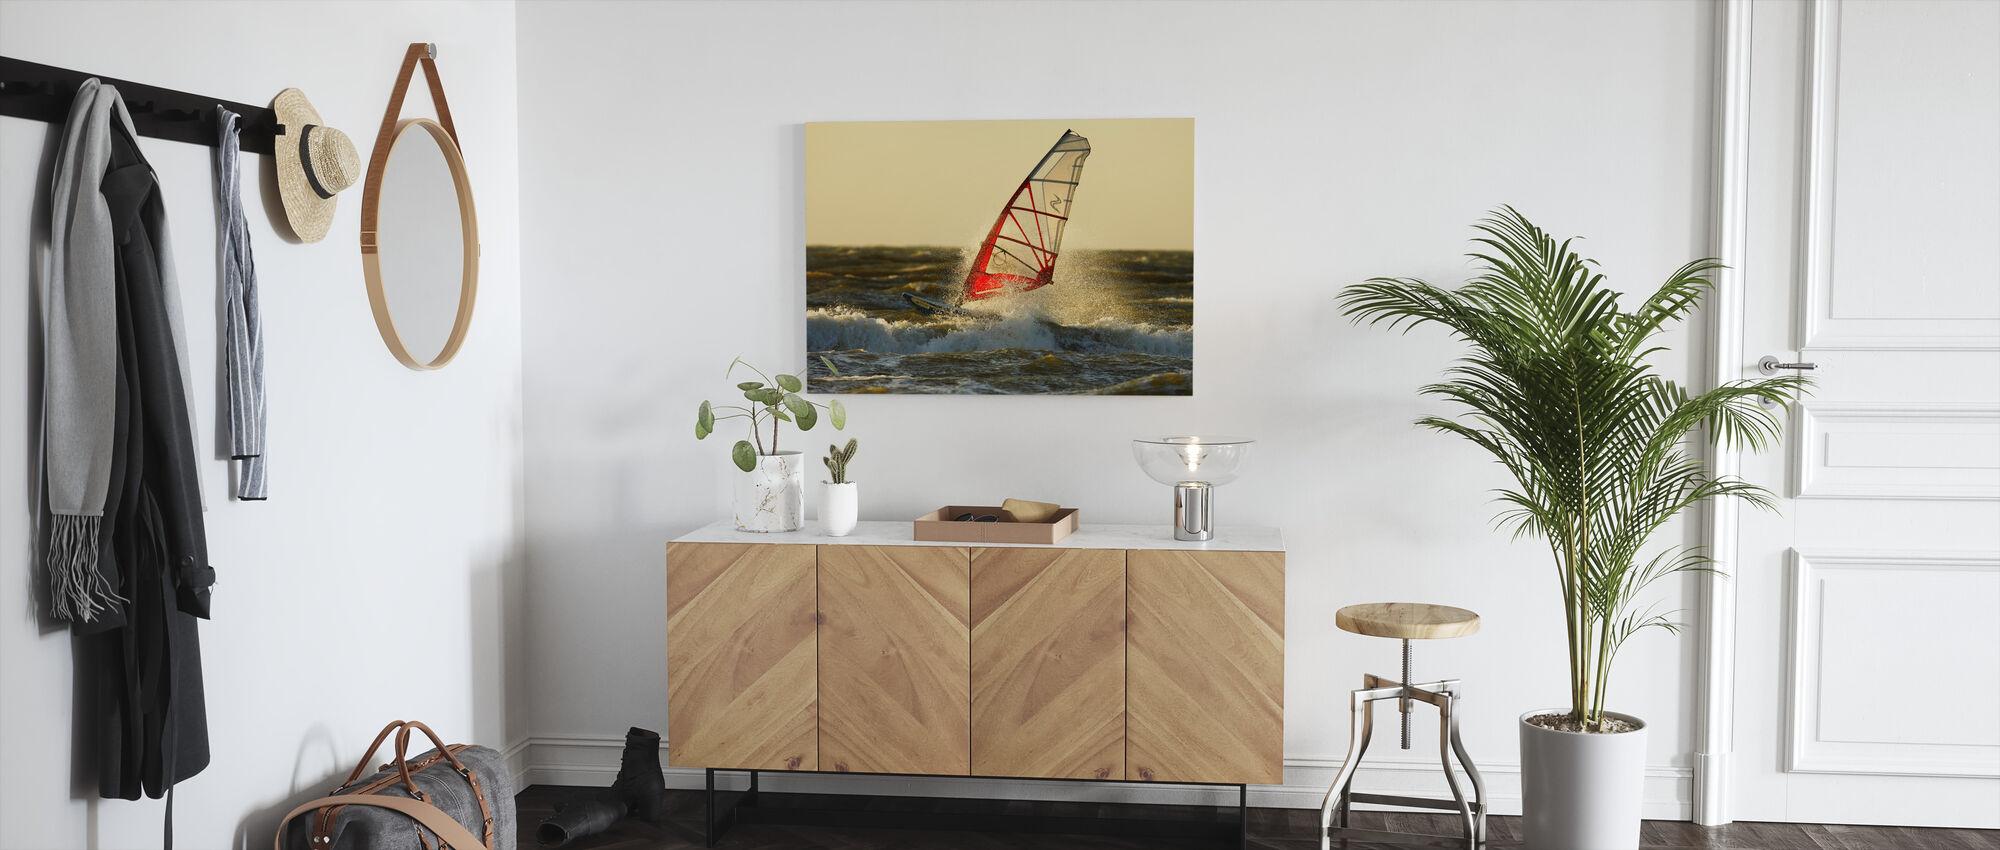 Surfing i Sverige, Europa - Canvastavla - Hall